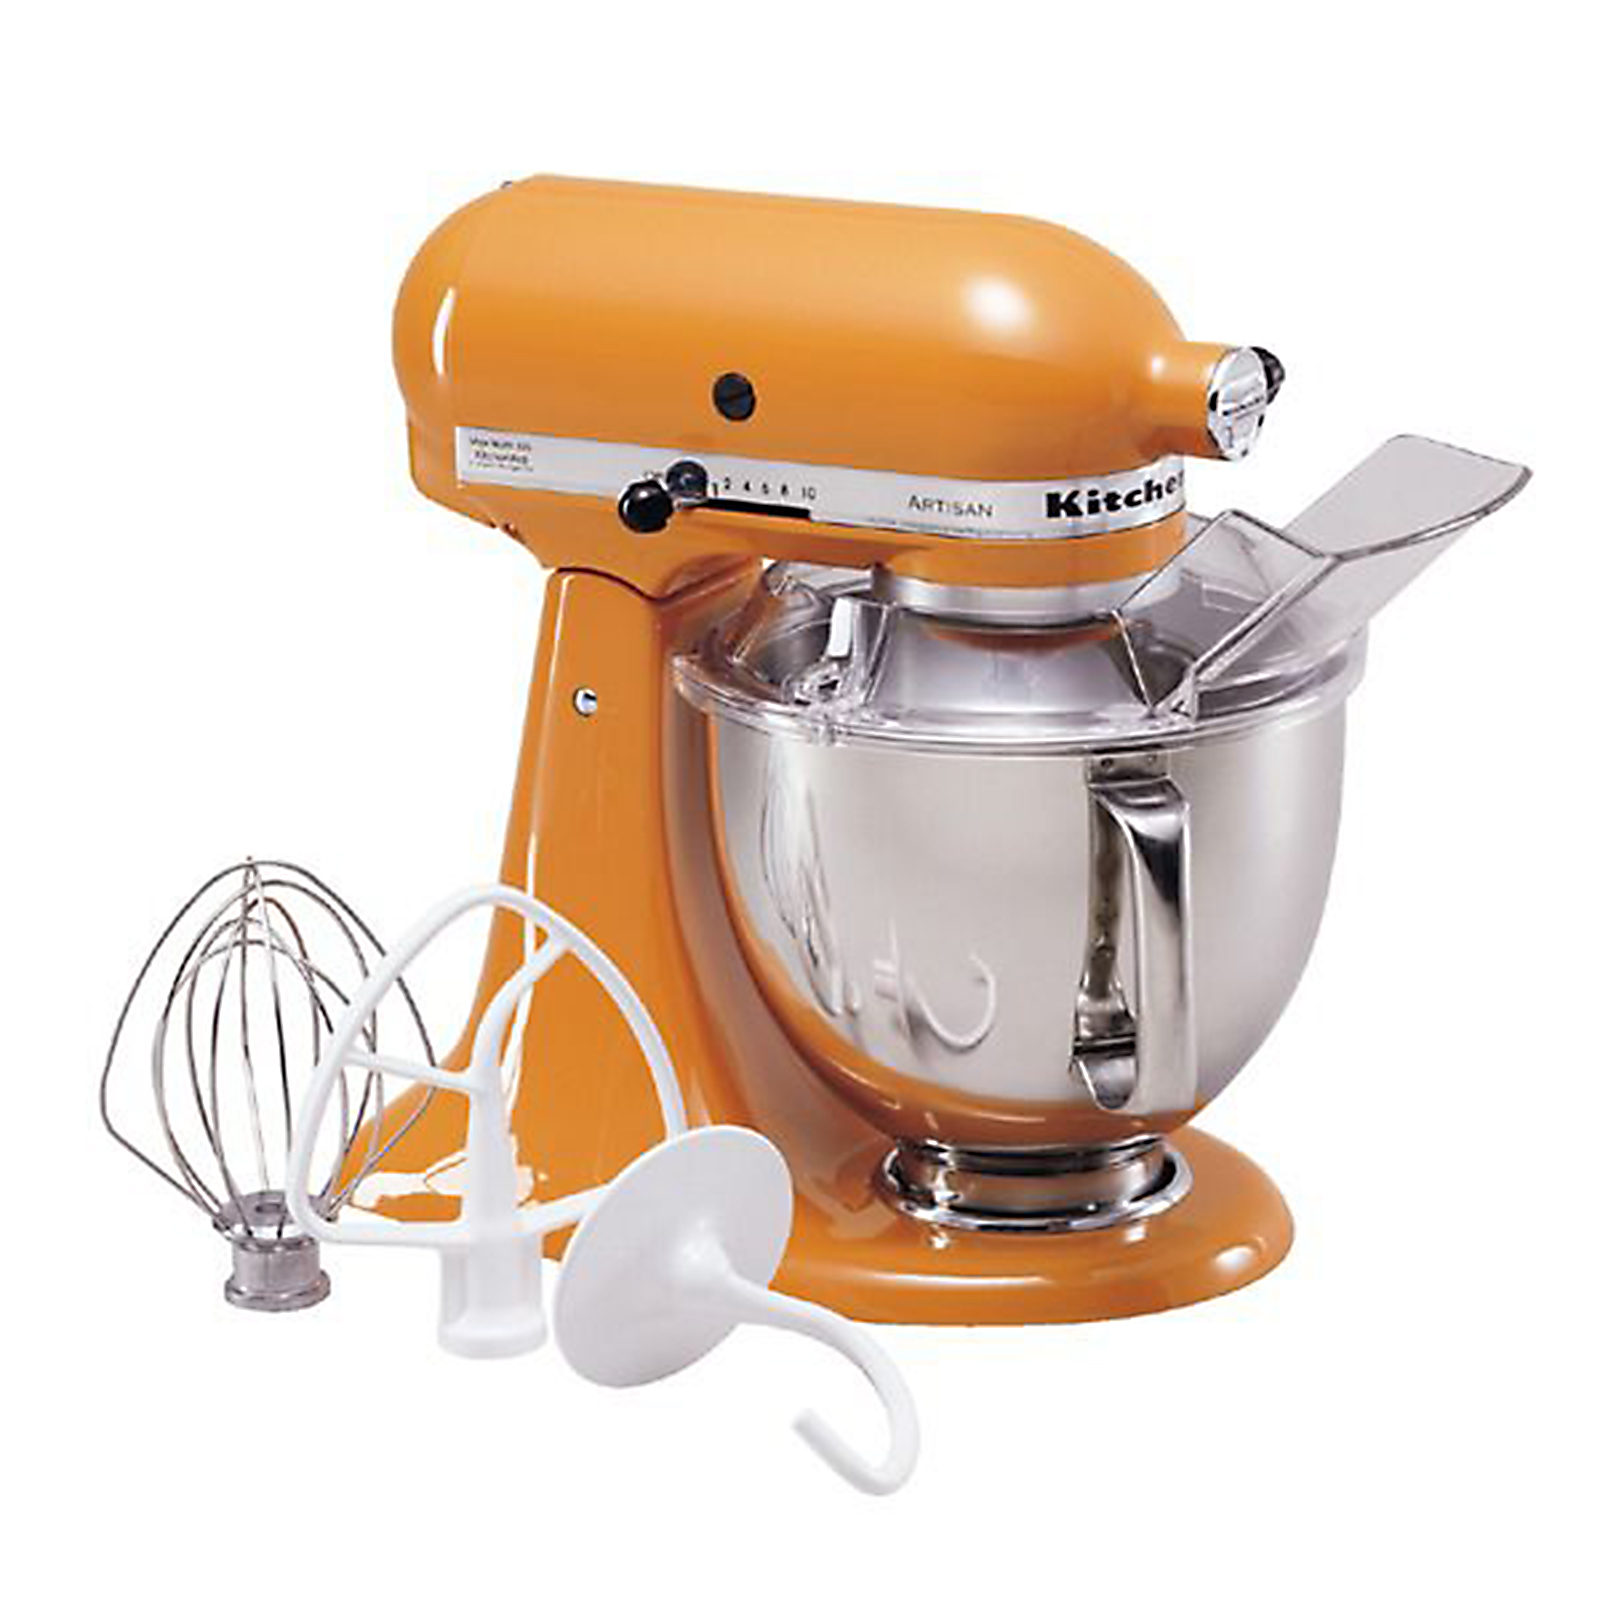 kitchen aid stand up mixer make your own island kitchenaid ksm150pstg artisan series 5 quart tangerine